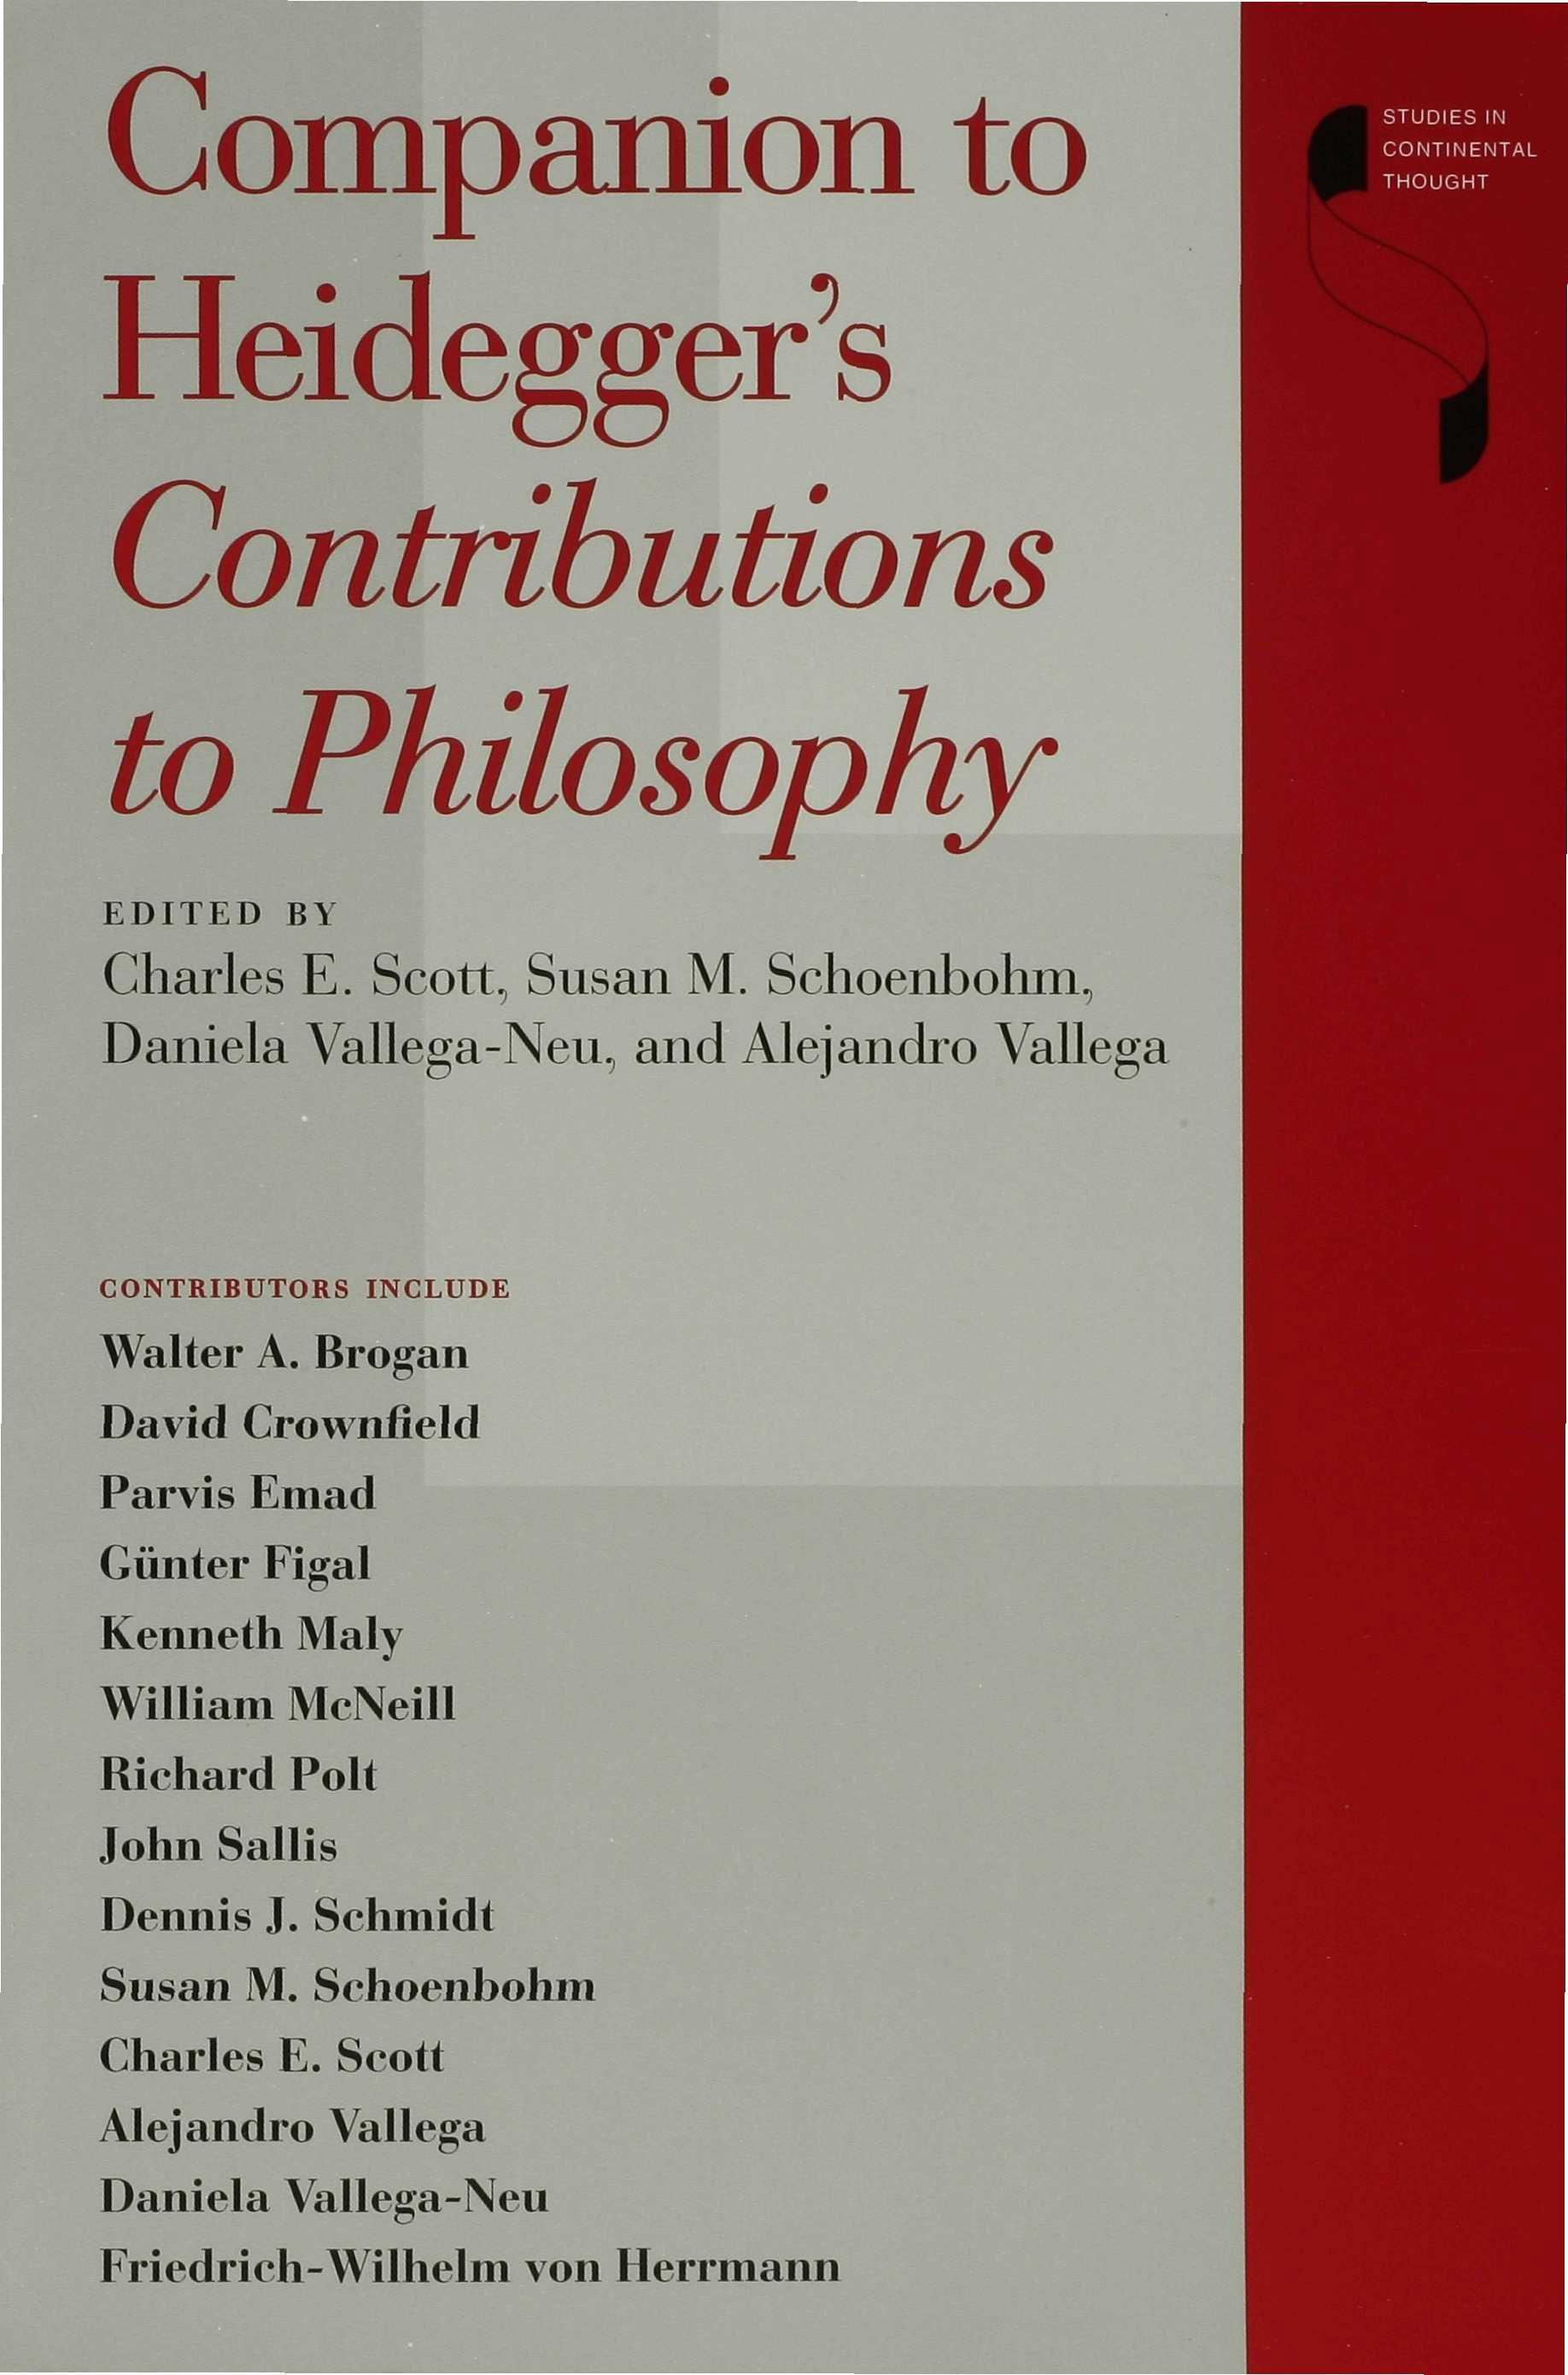 Companion to Heidegger's Contributions to Philosophy EB9780253108395